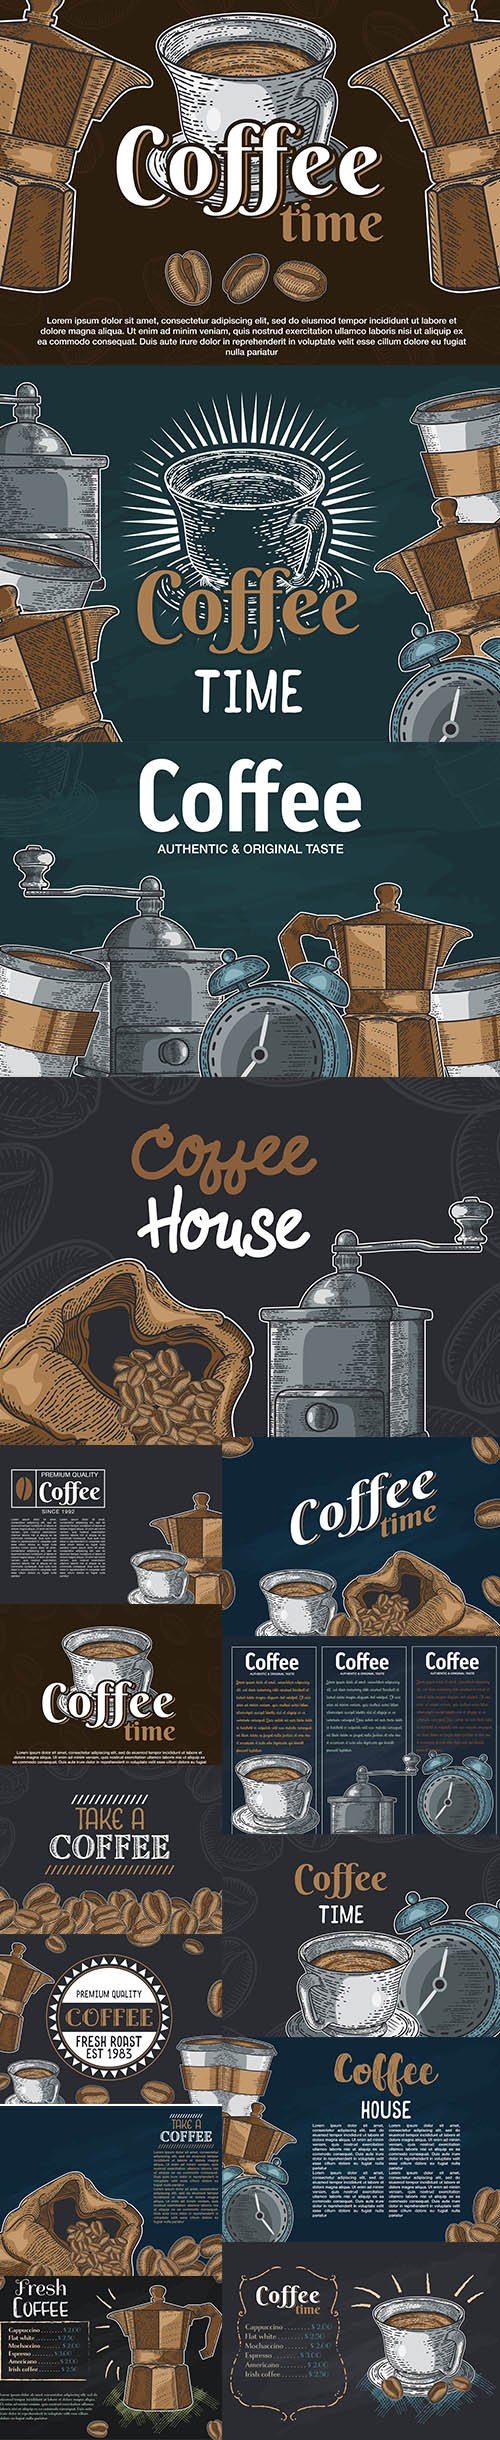 Hand-Drawn Sketch Illustration Coffee Design Vector